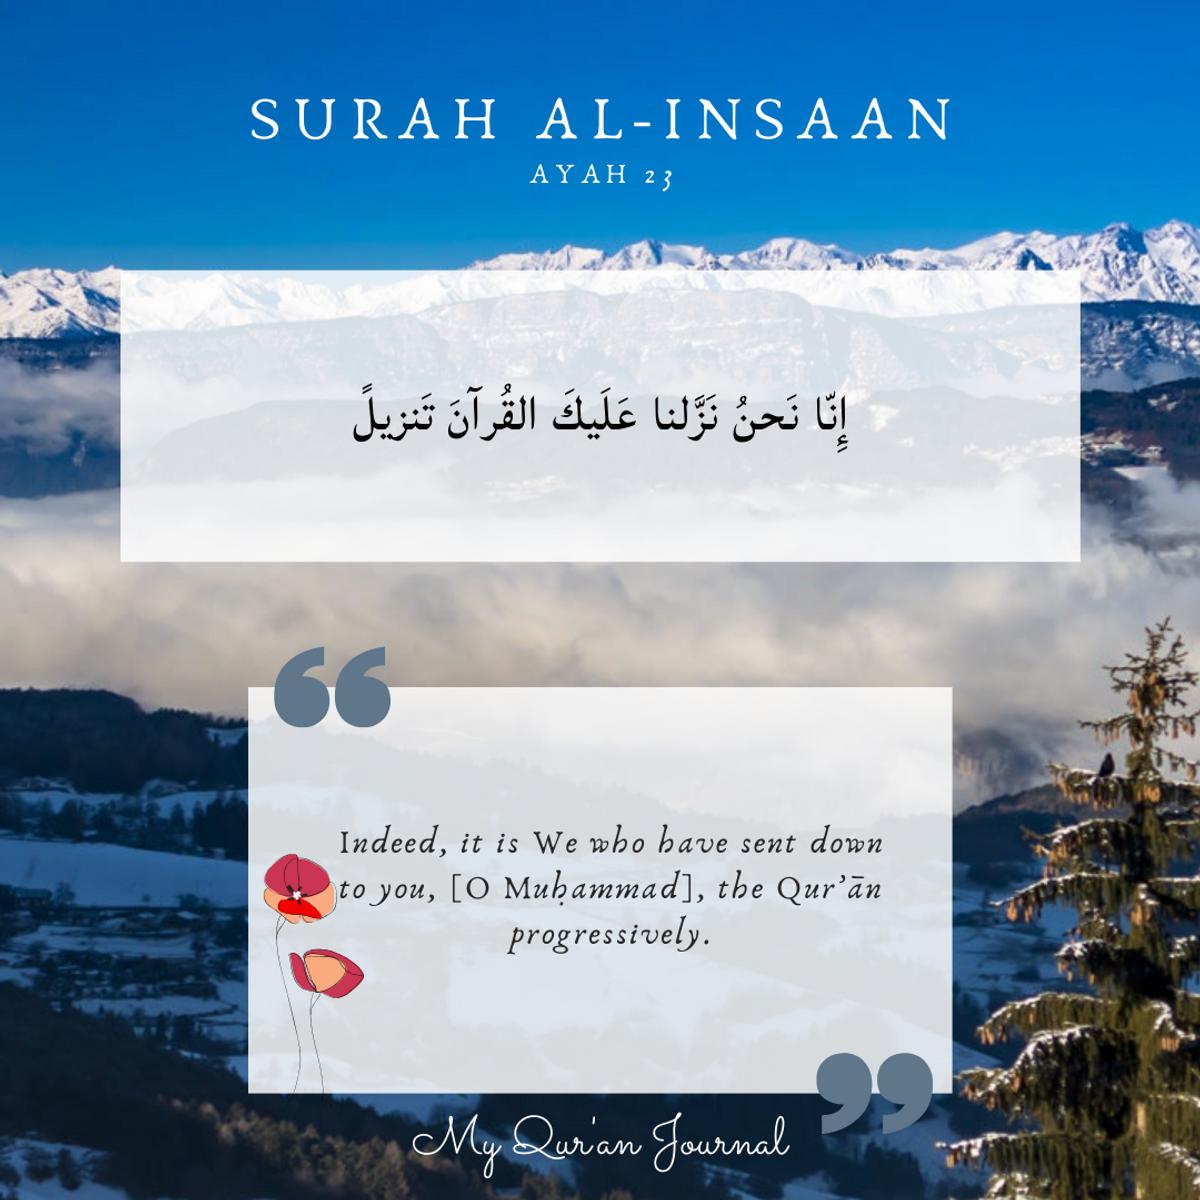 Surah Al-Insaan Ayah 23